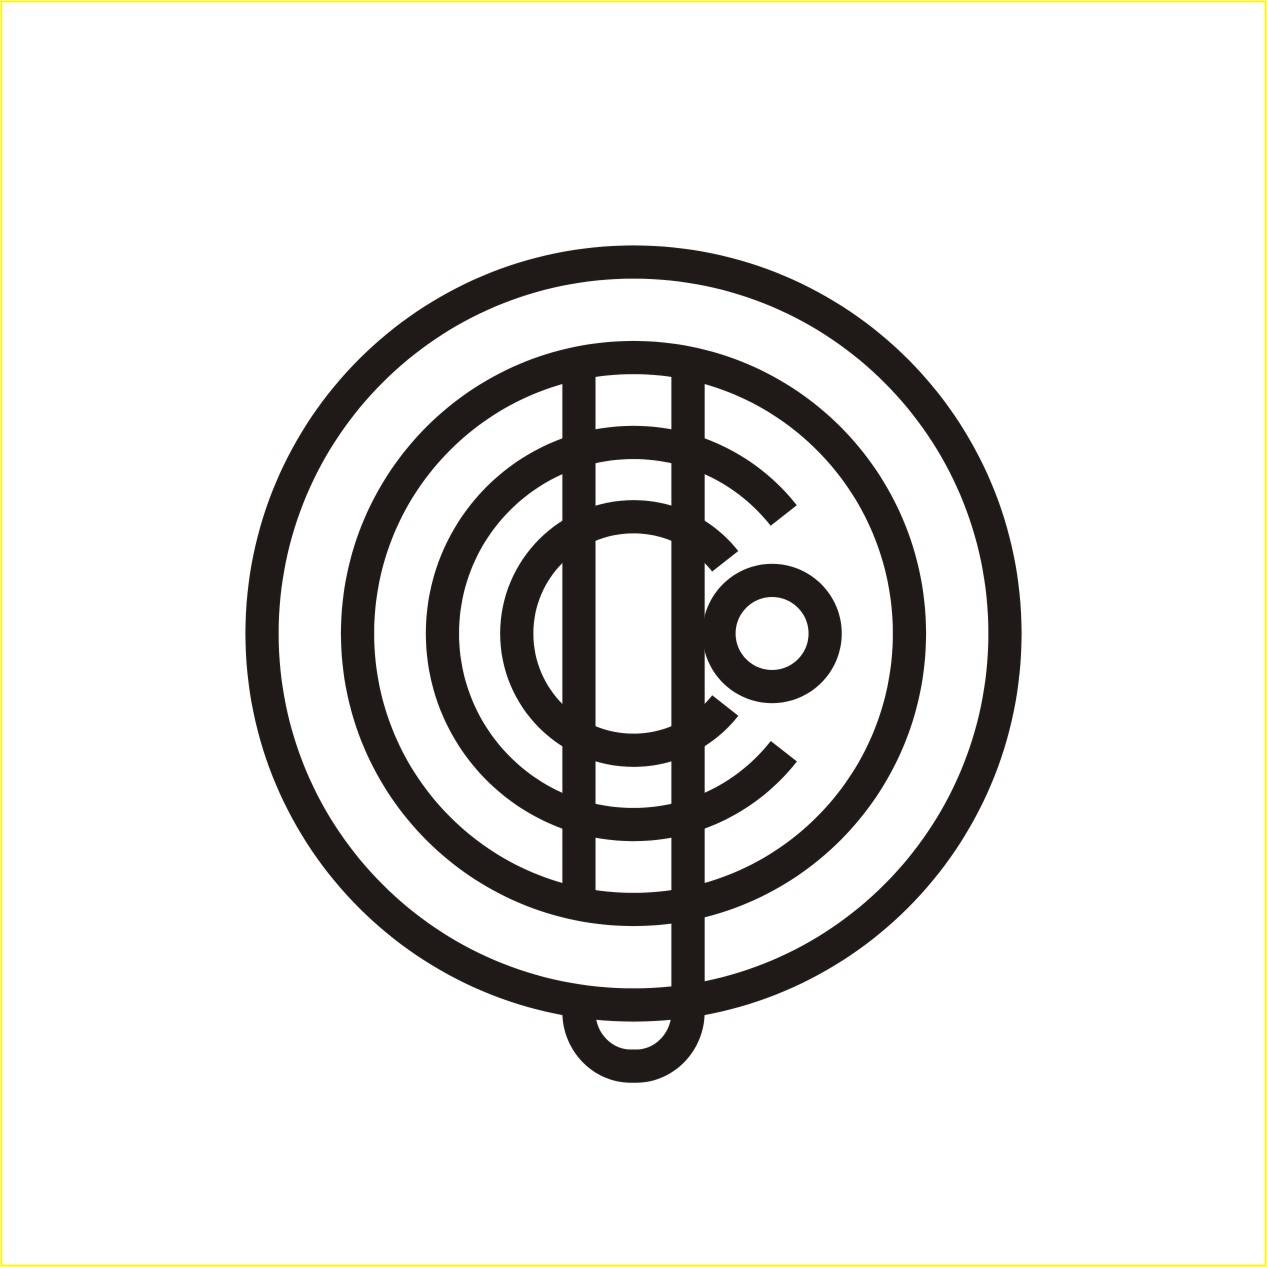 Doehl-Jar Company, PO Box 80341, Stoneham, MA, 02180, USA